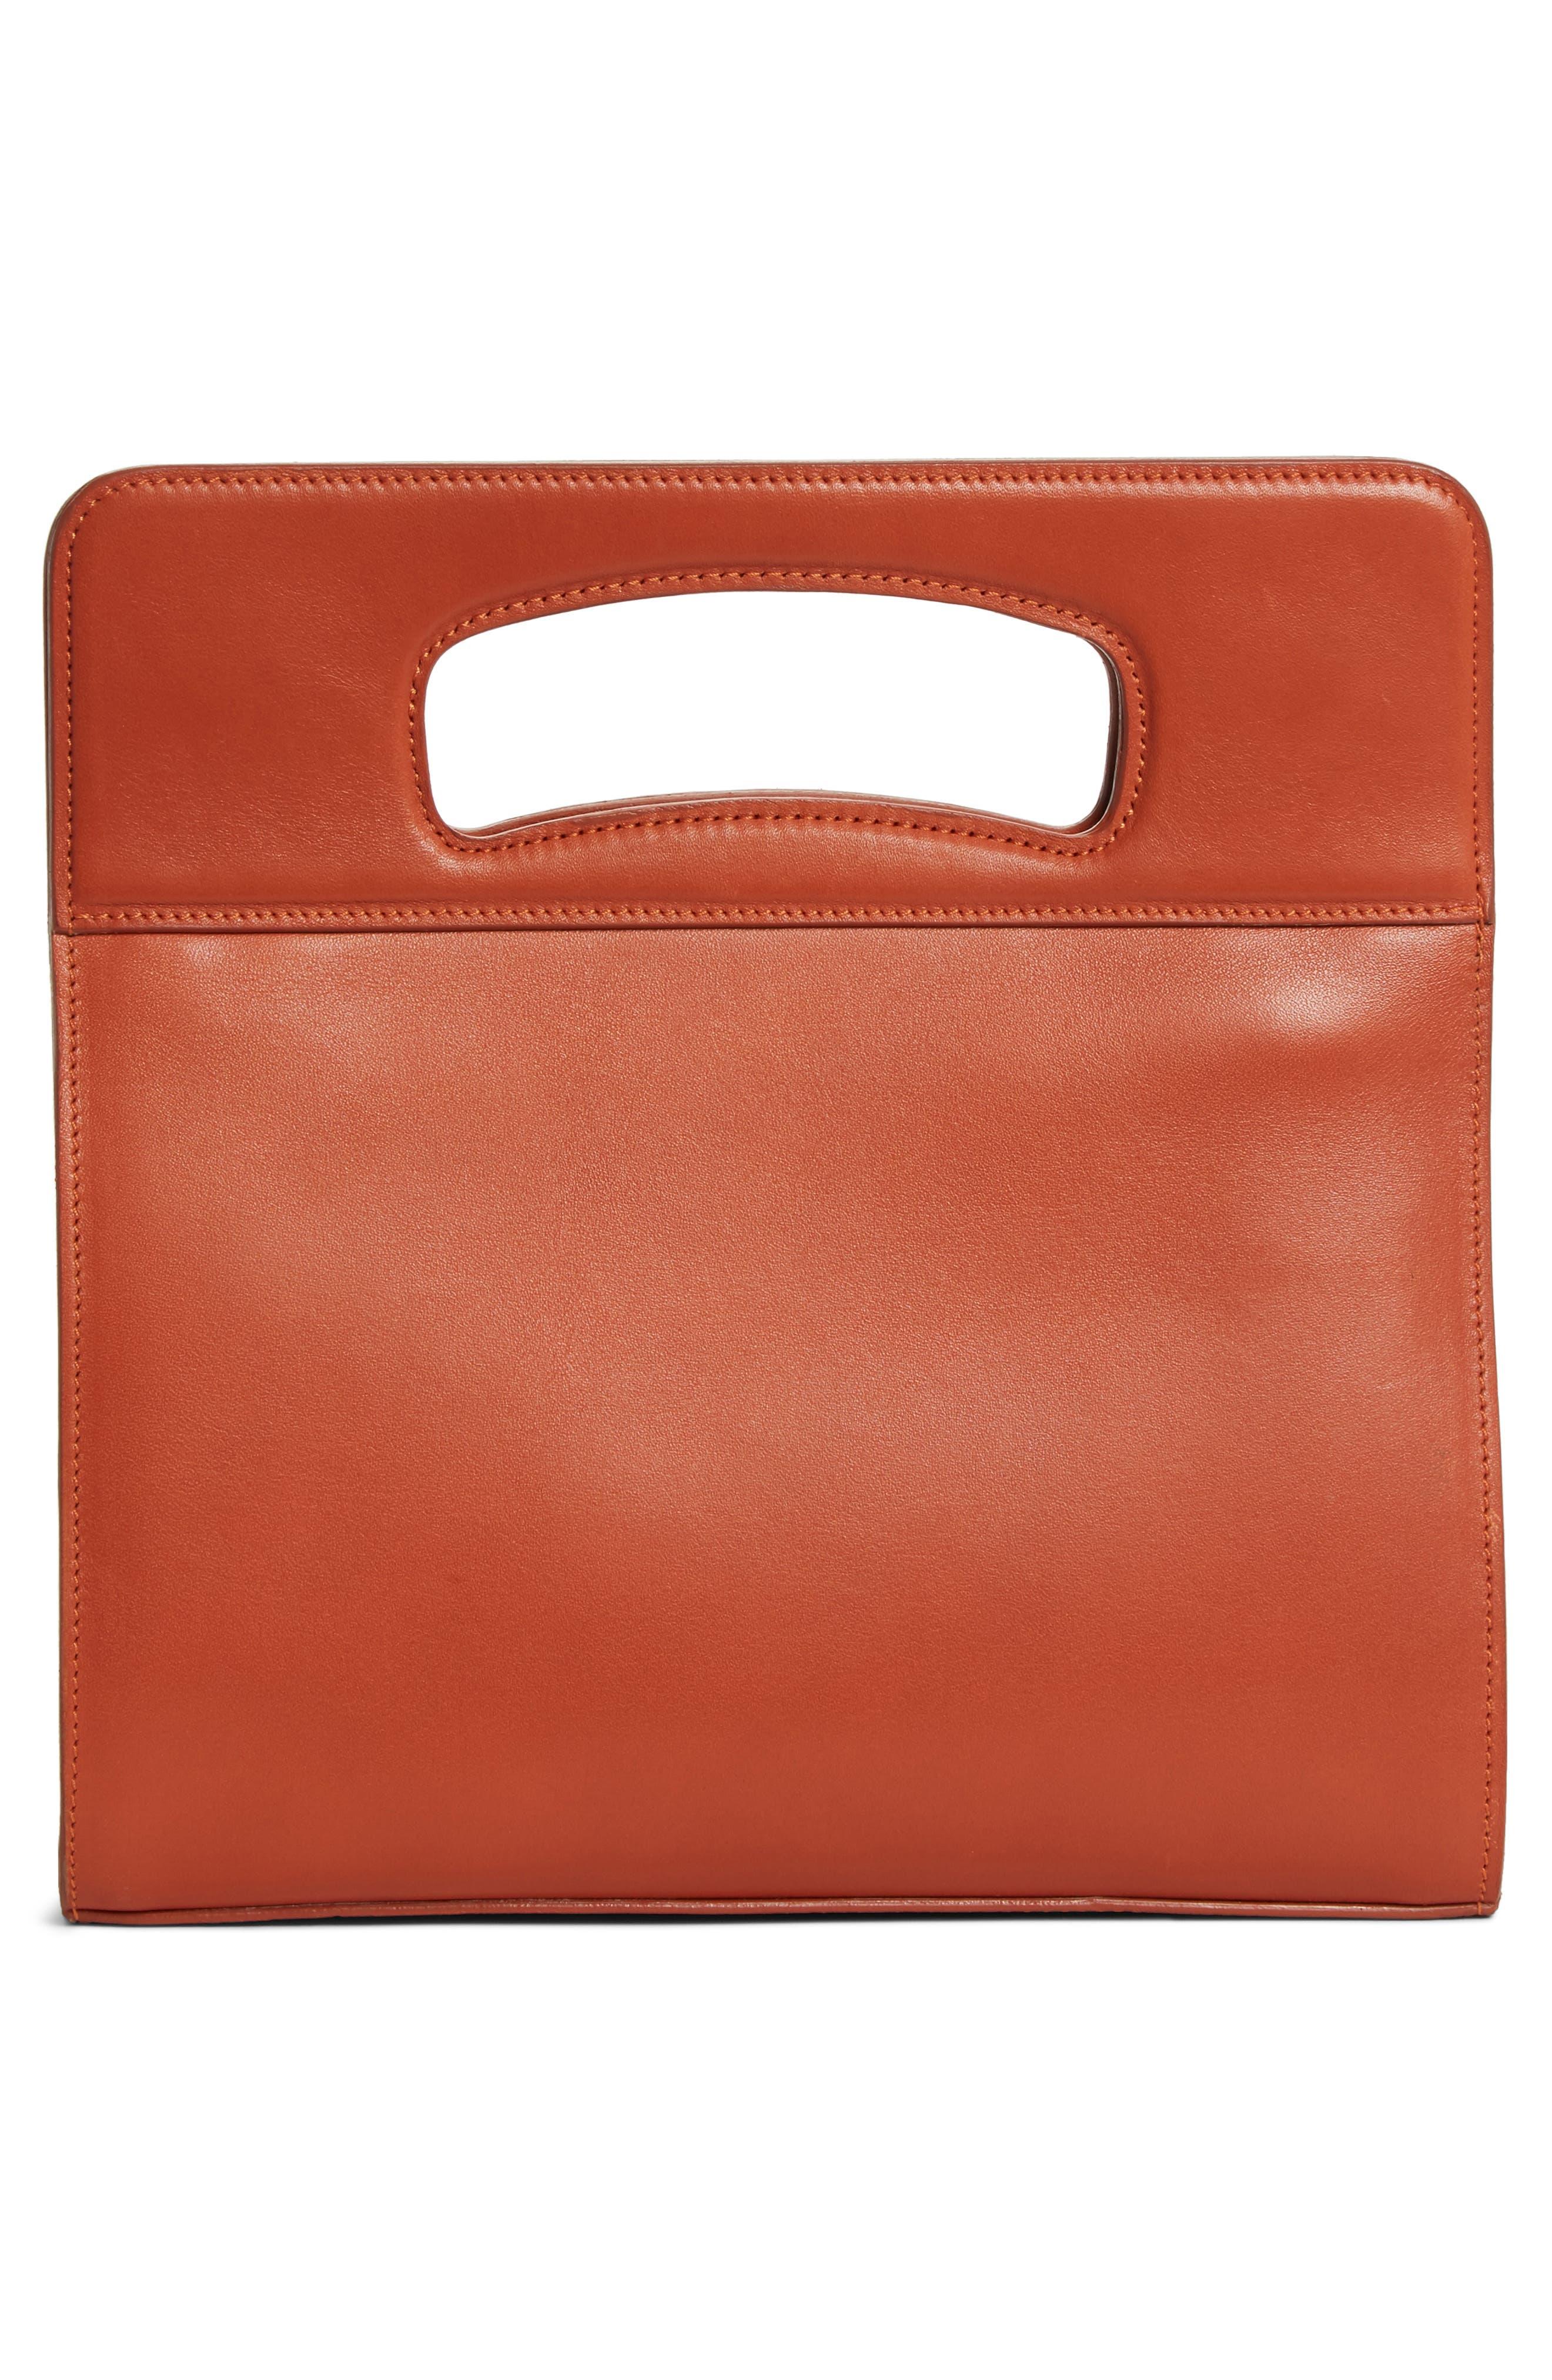 Gilda Crossbody Bag,                             Alternate thumbnail 4, color,                             Clove